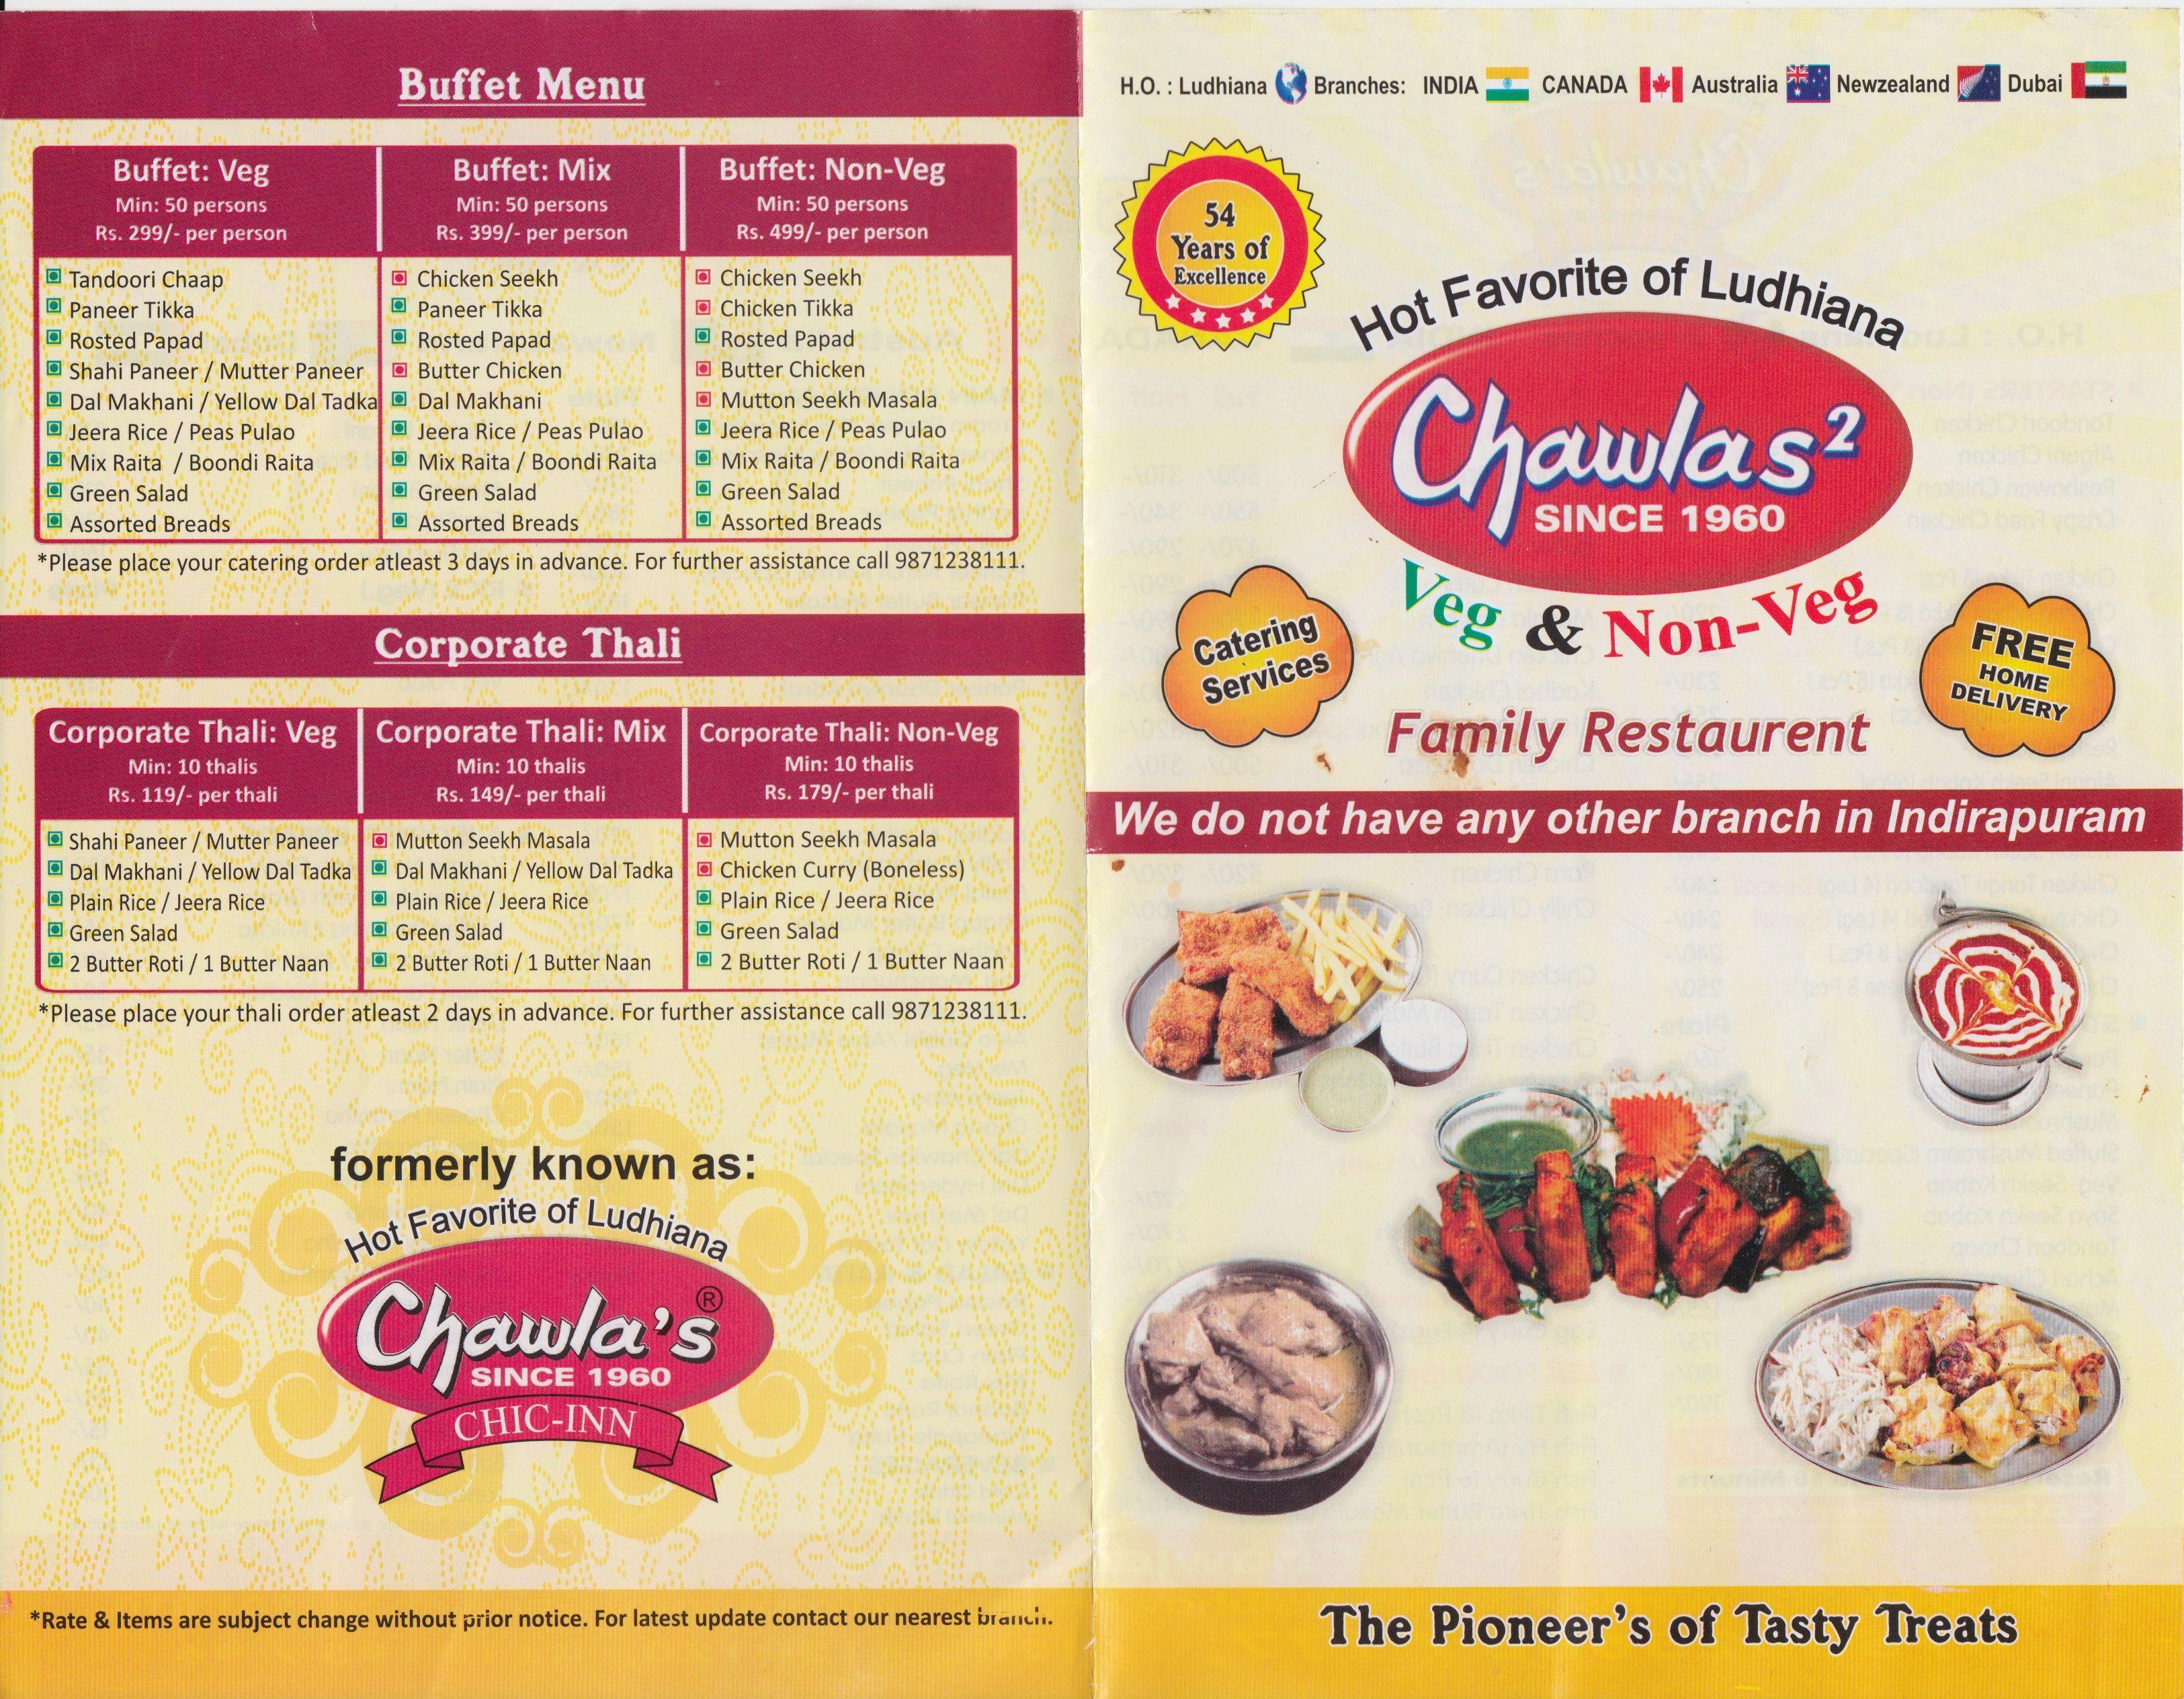 Chawlas Indirapuram Menu Chawla Chicken Indirapuram Chawla Chicken Menu North Indian Restaurants